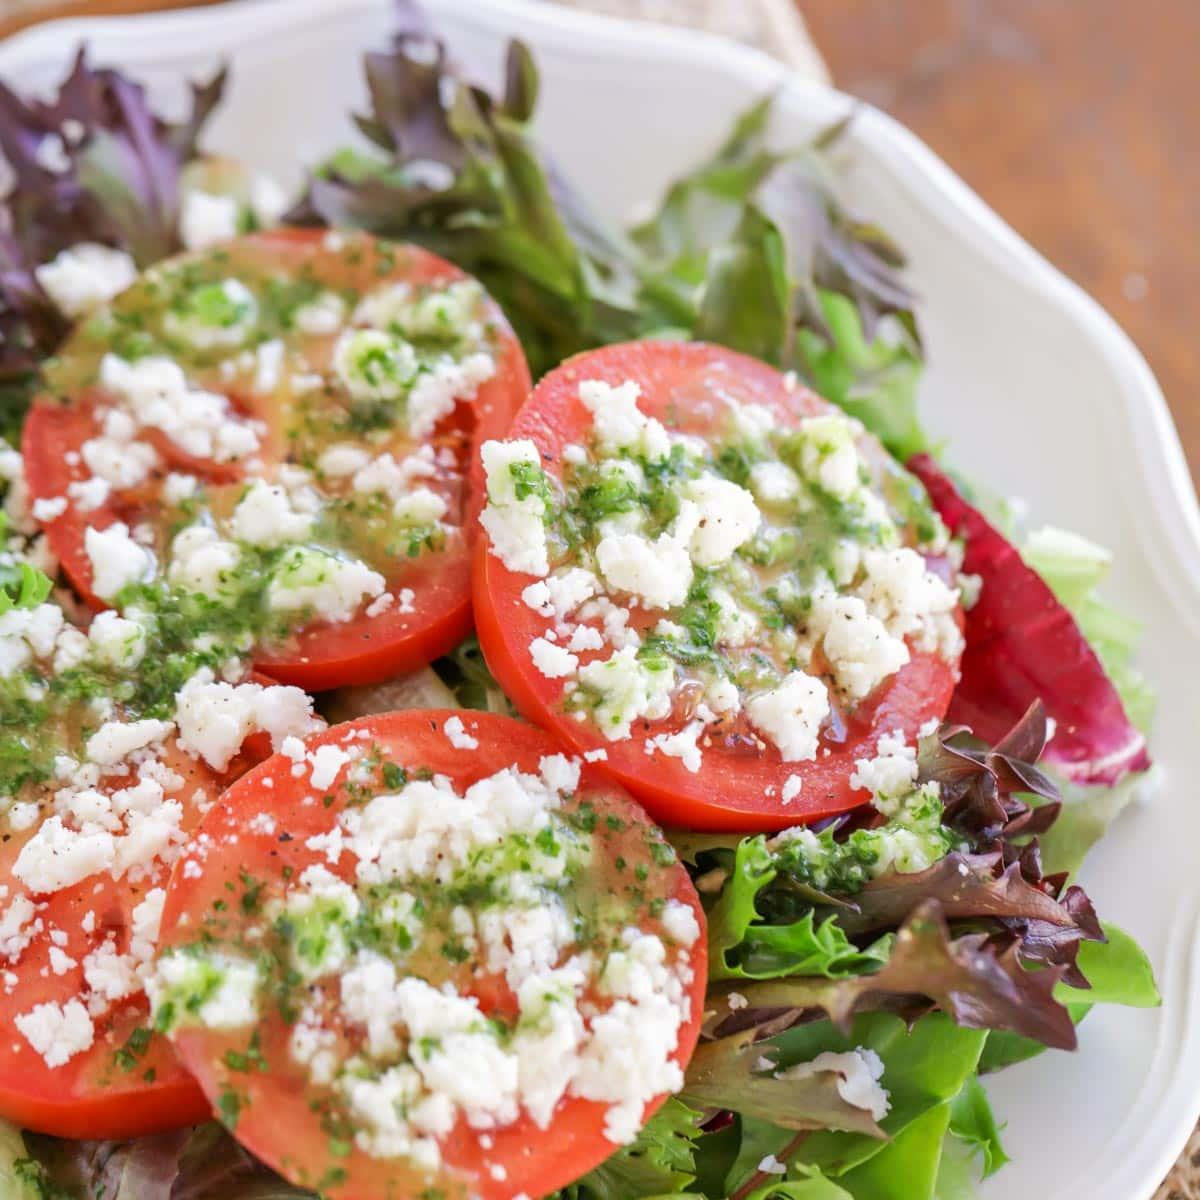 Southwest caprese salad with tomatoes, queso fresco, and cilantro lime vinaigrette